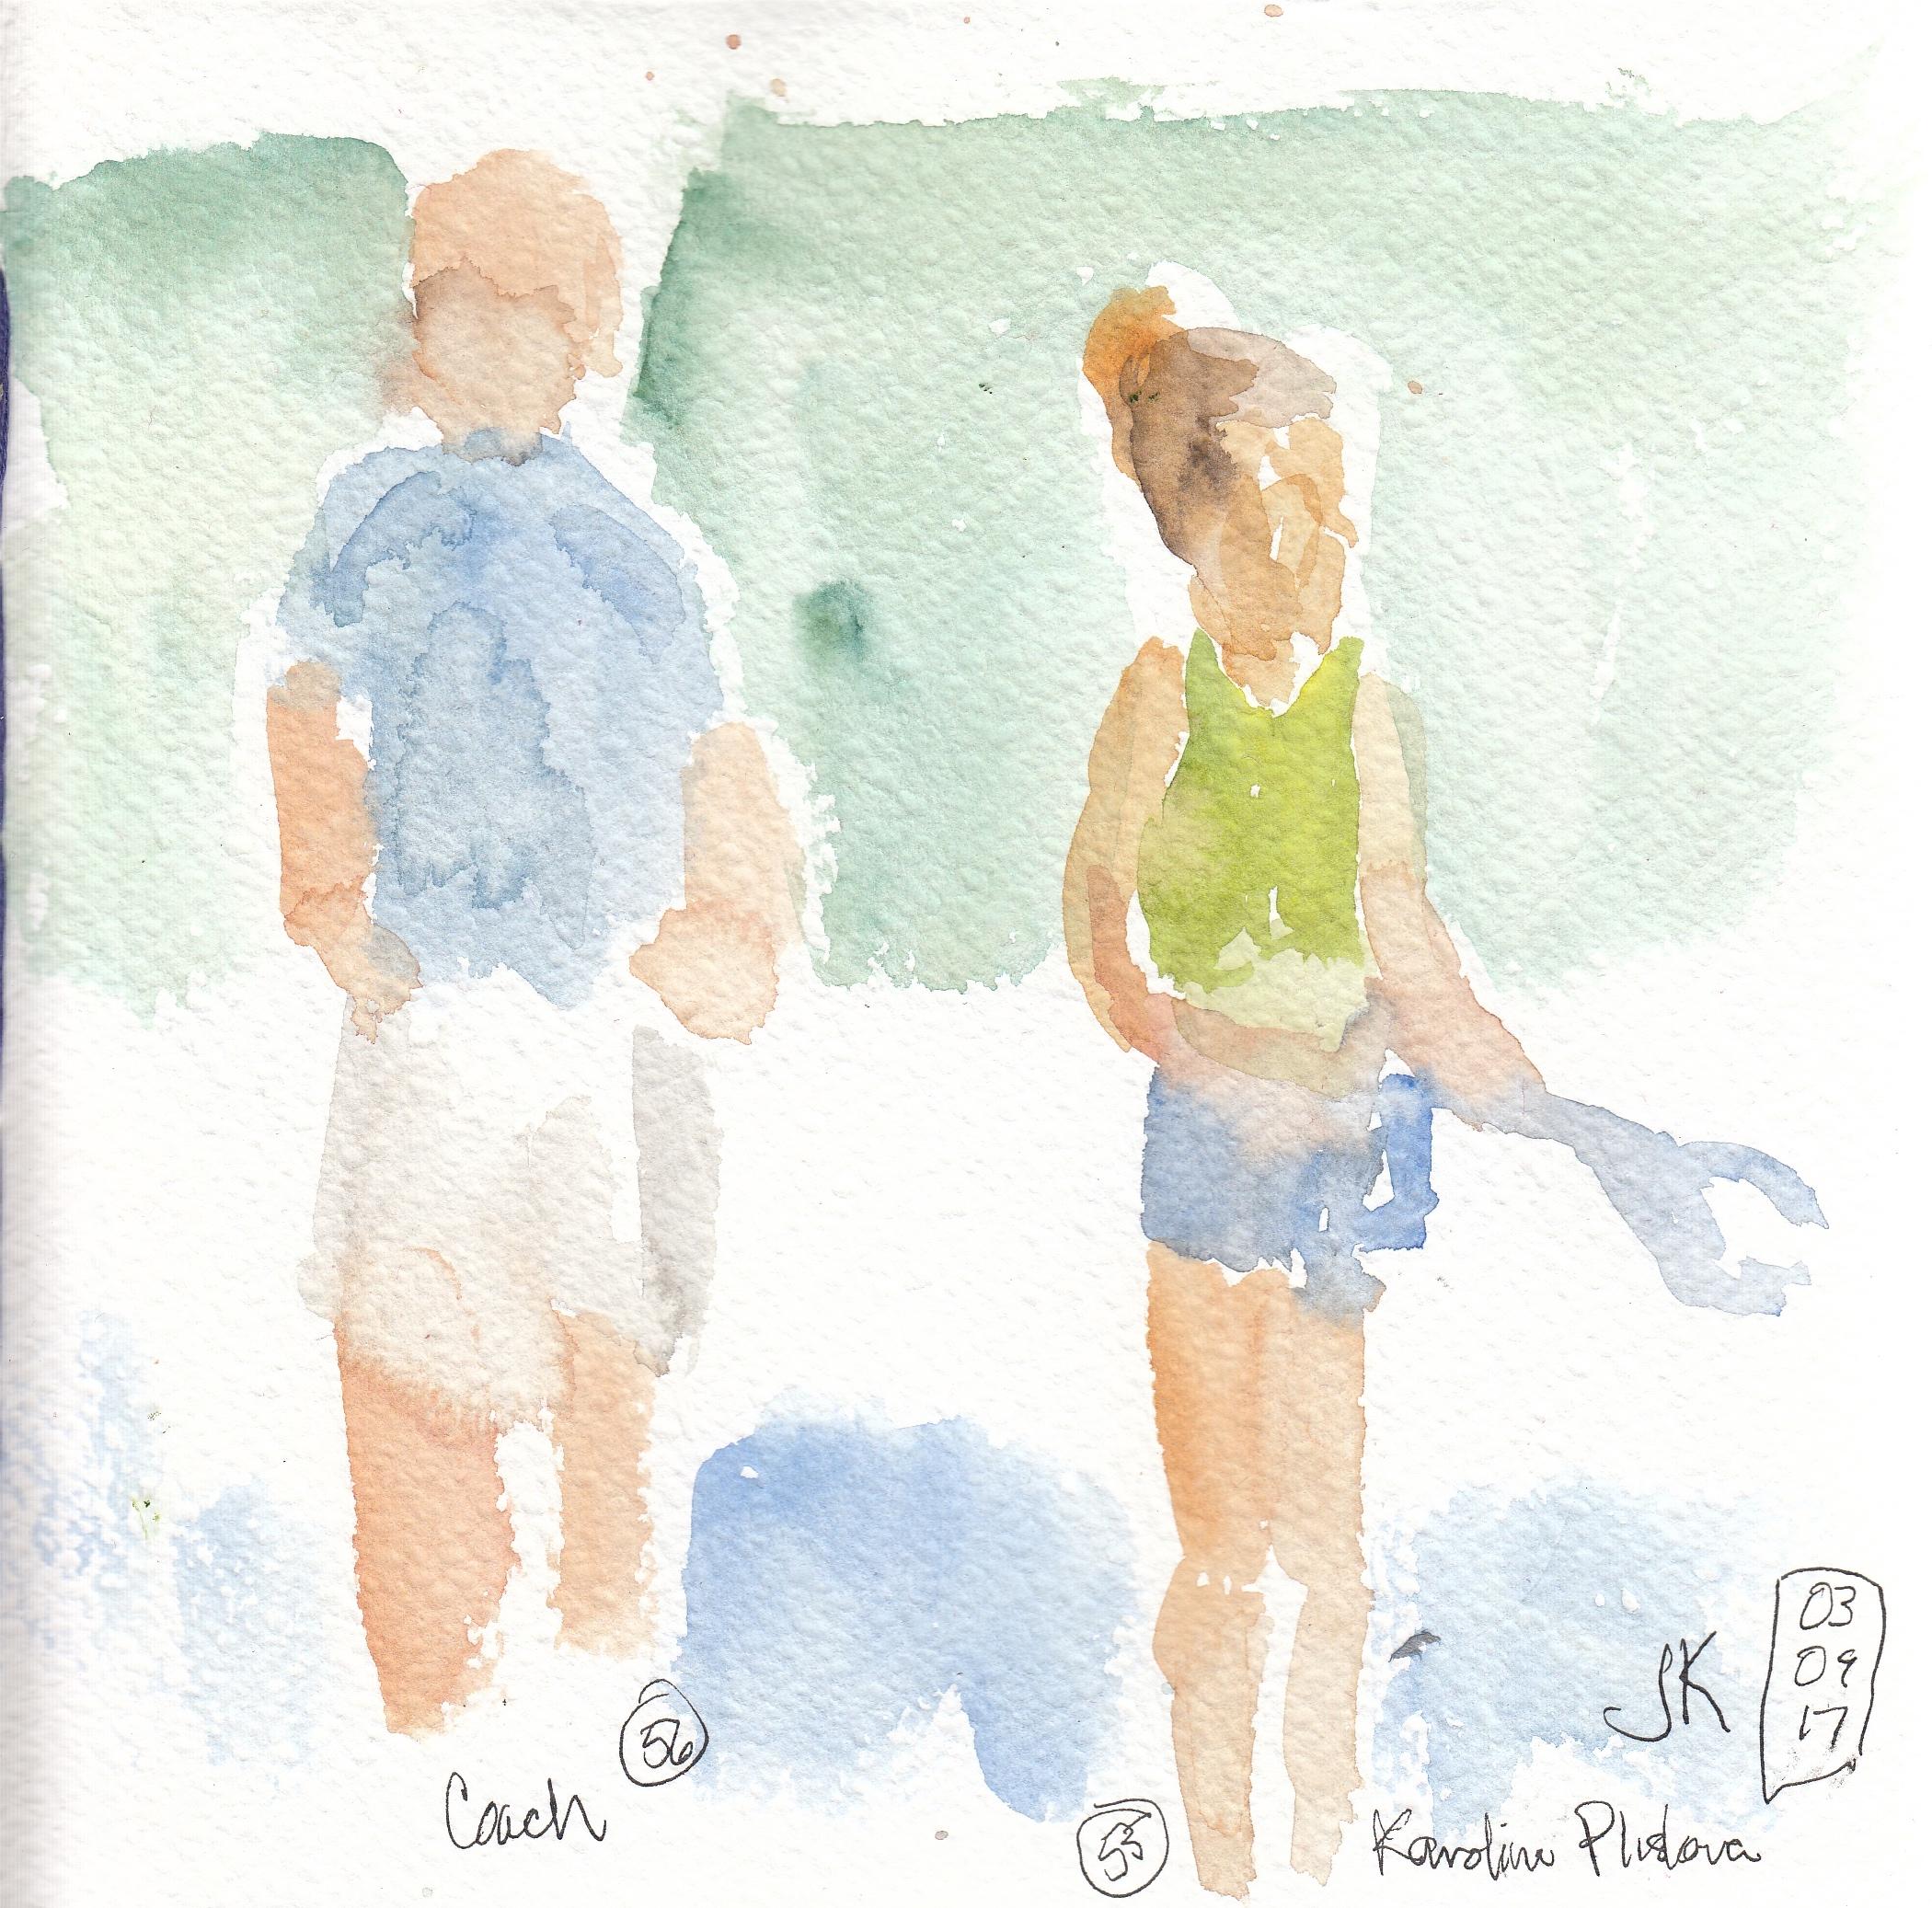 Nos. 55 & 56 - Karolina Pliskova and her coach on the practice courts